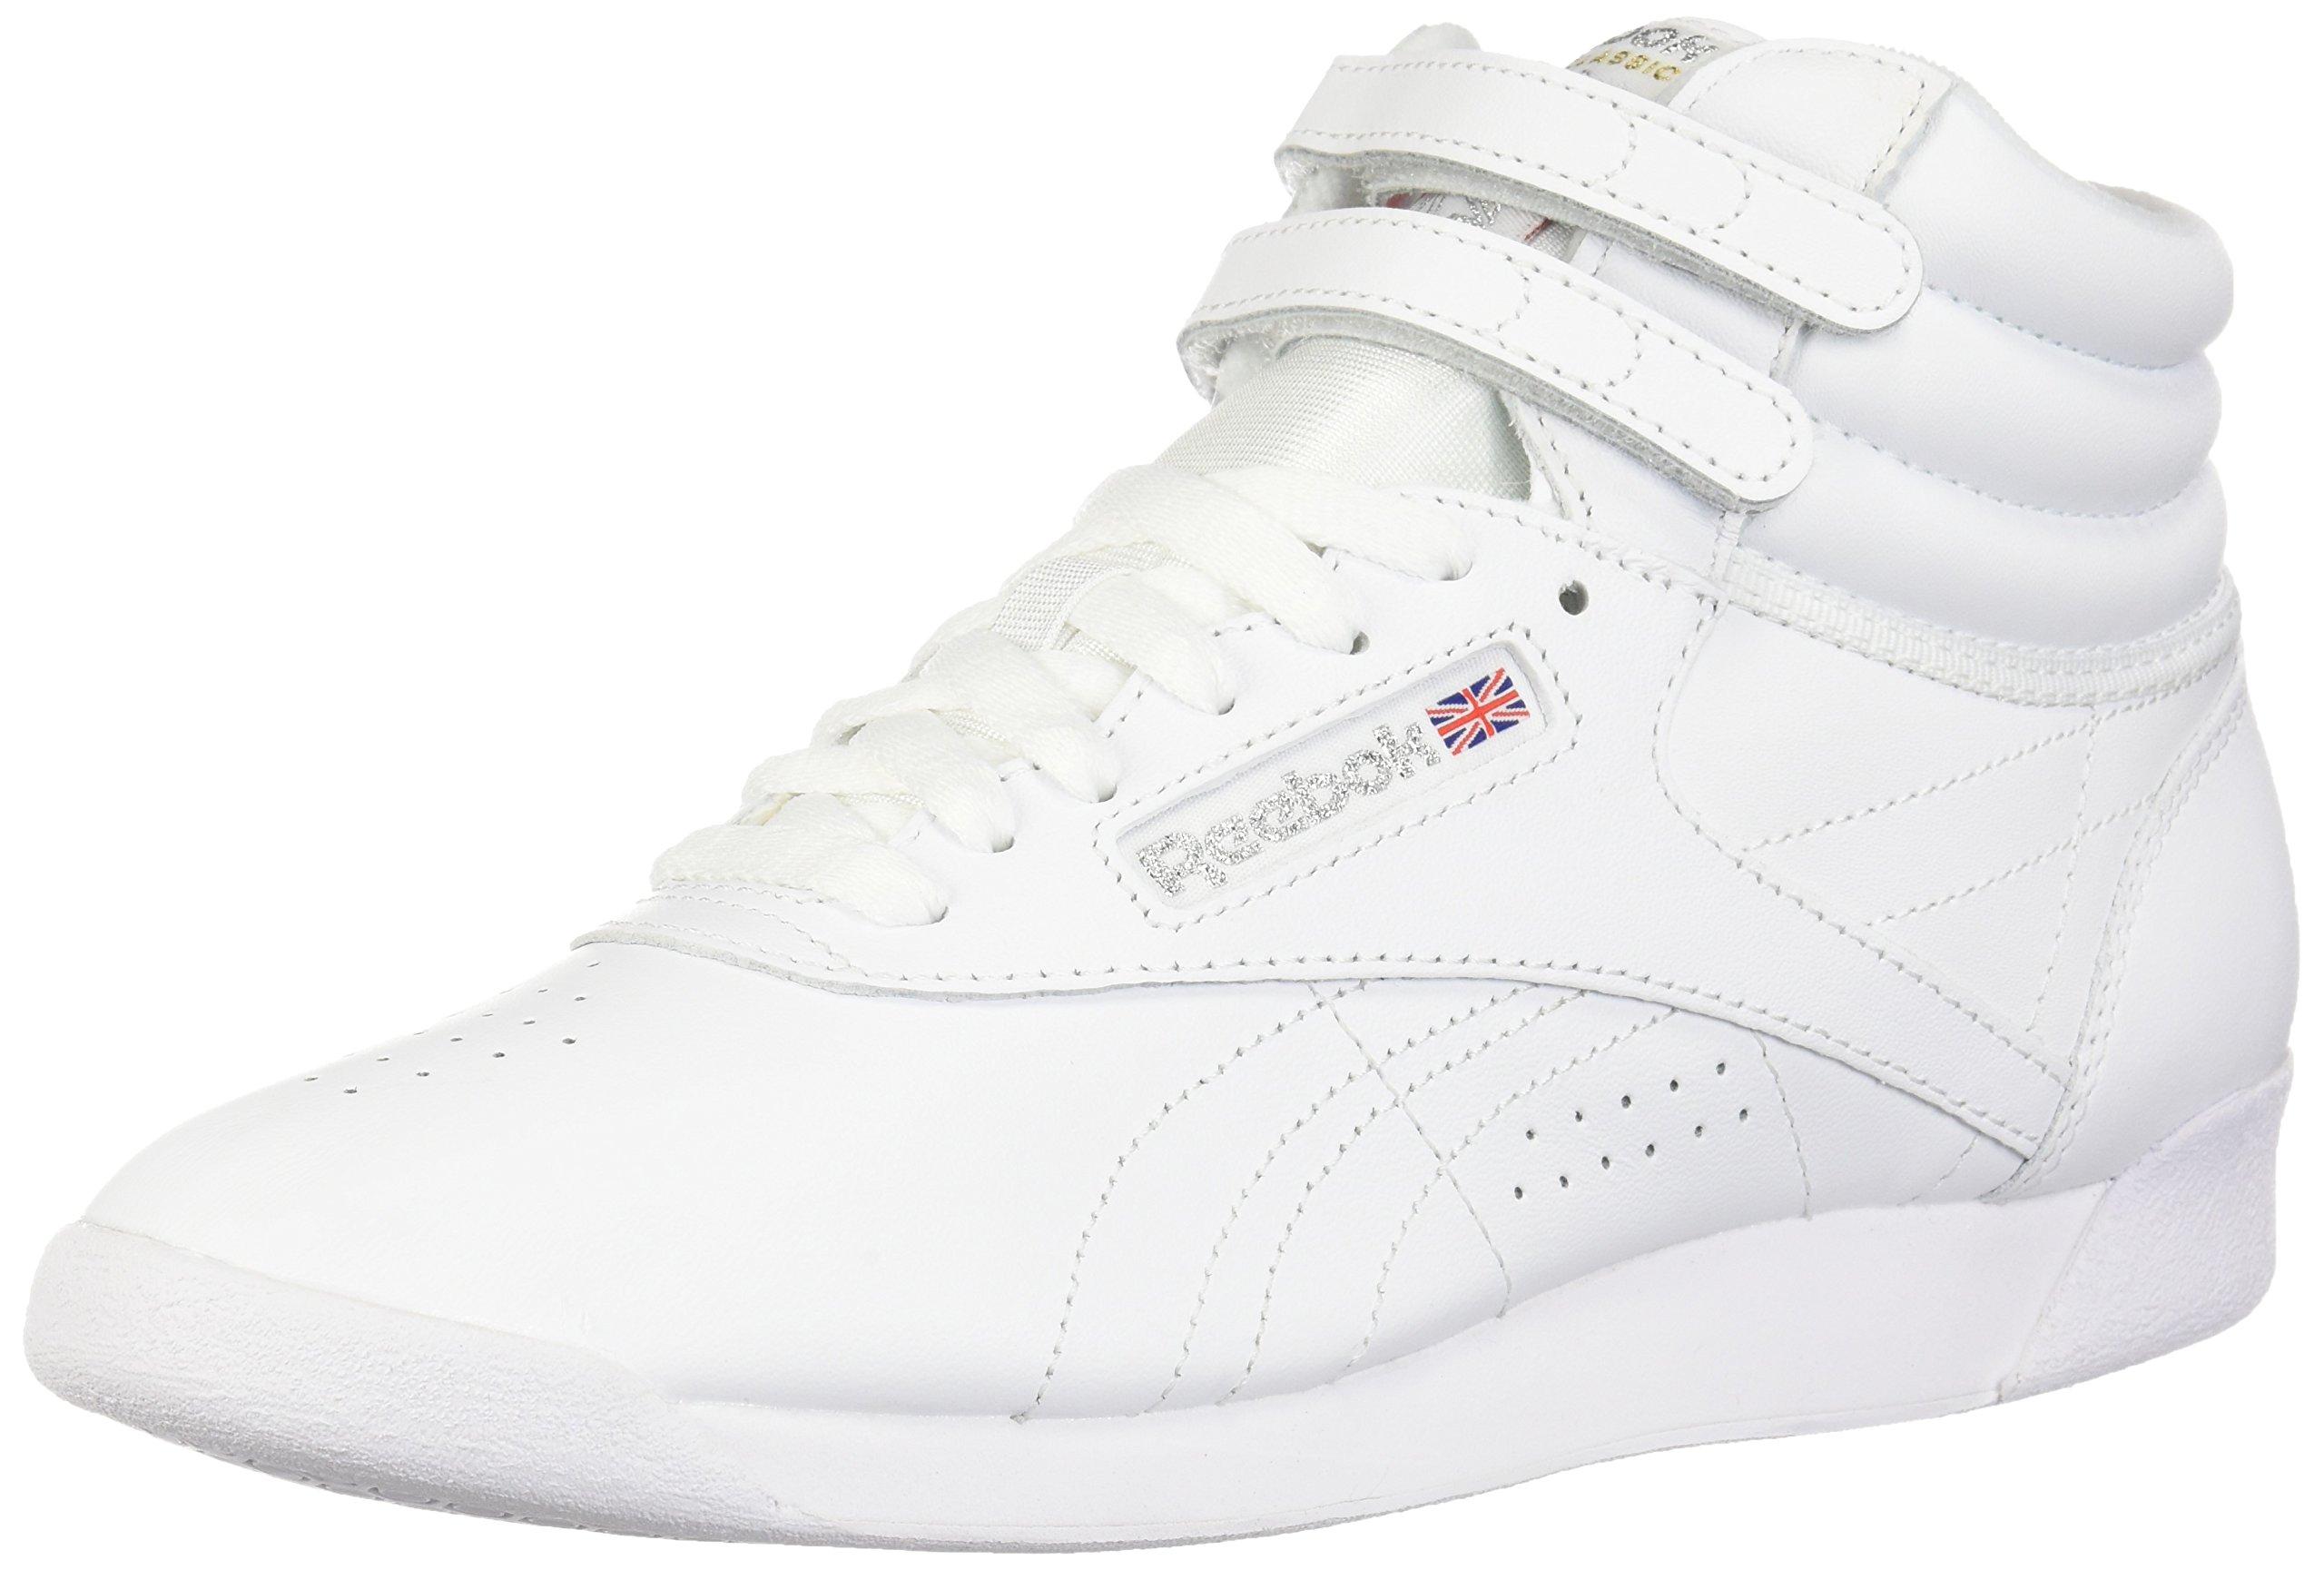 Reebok Women's Freestyle Hi Walking Shoe, White/Silver, 7.5 M US by Reebok